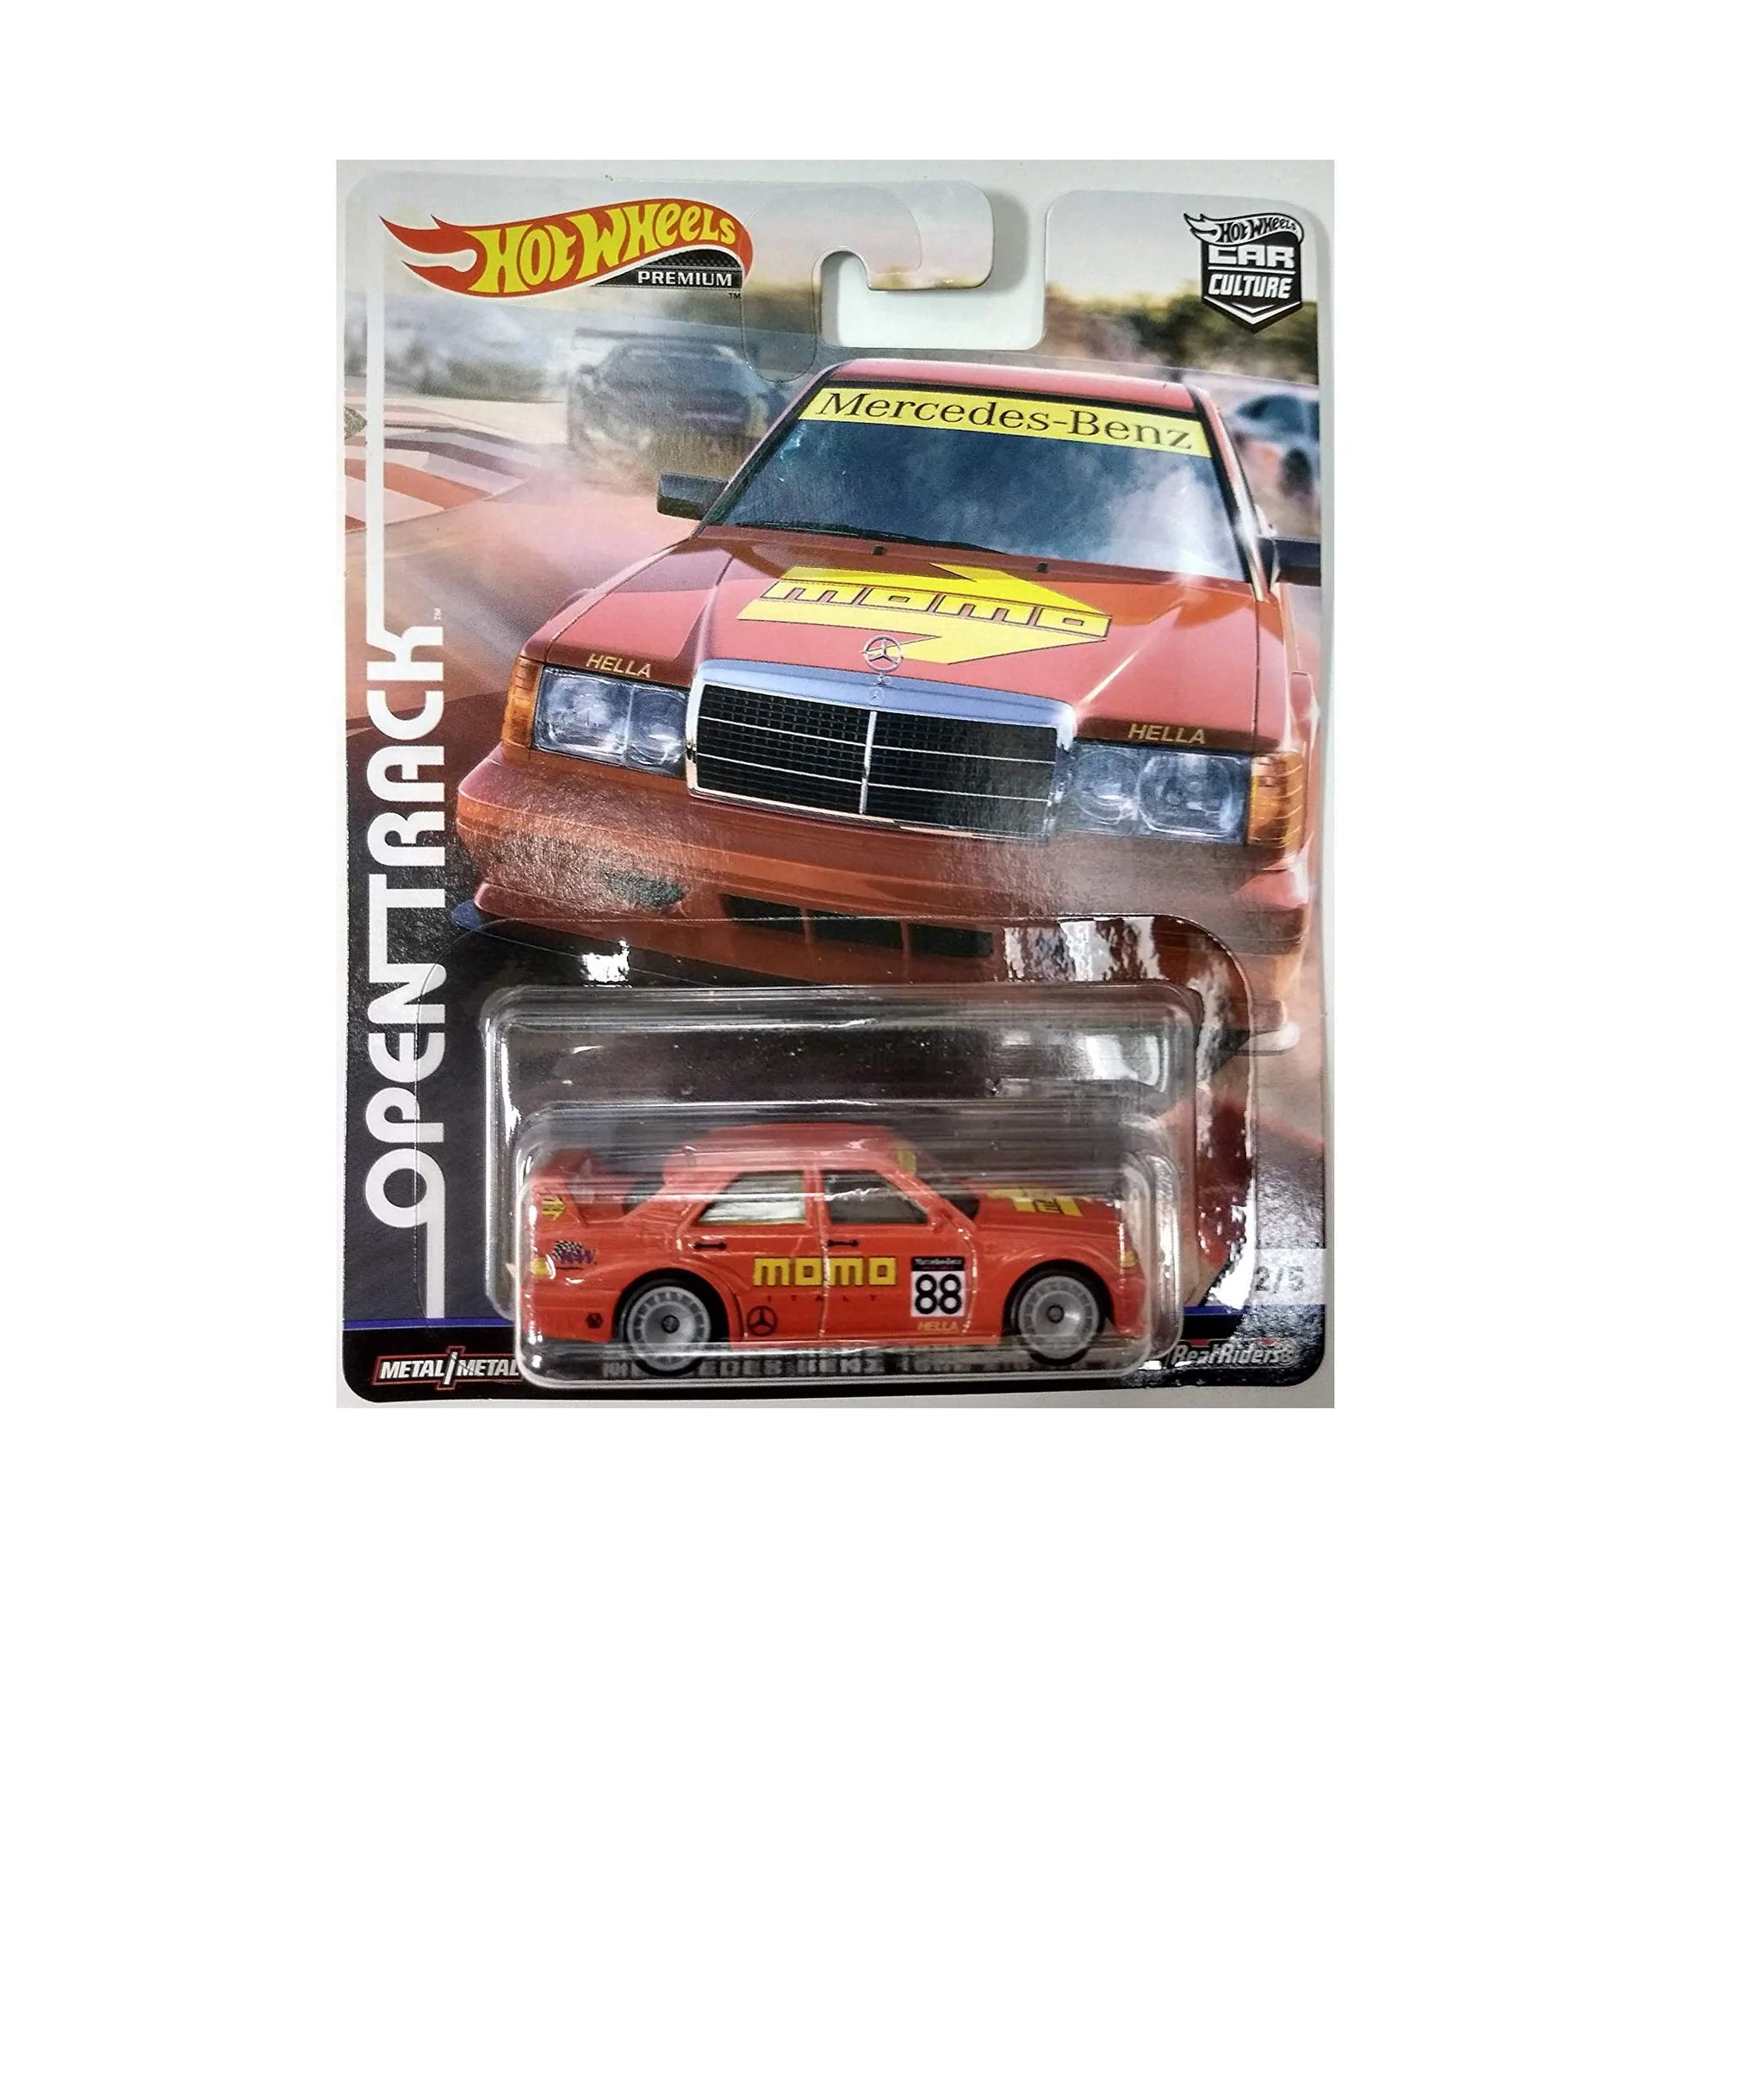 hight resolution of mercedes benz 190e car culture premium open track 2 5 hot wheels fpy86 956h